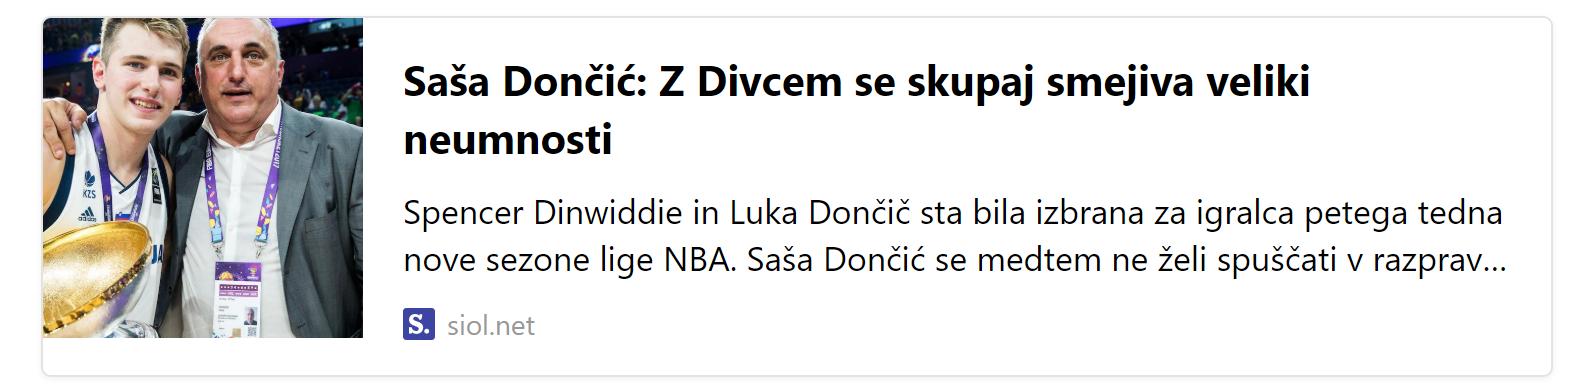 Luca Doncic Dad Vlade Divac